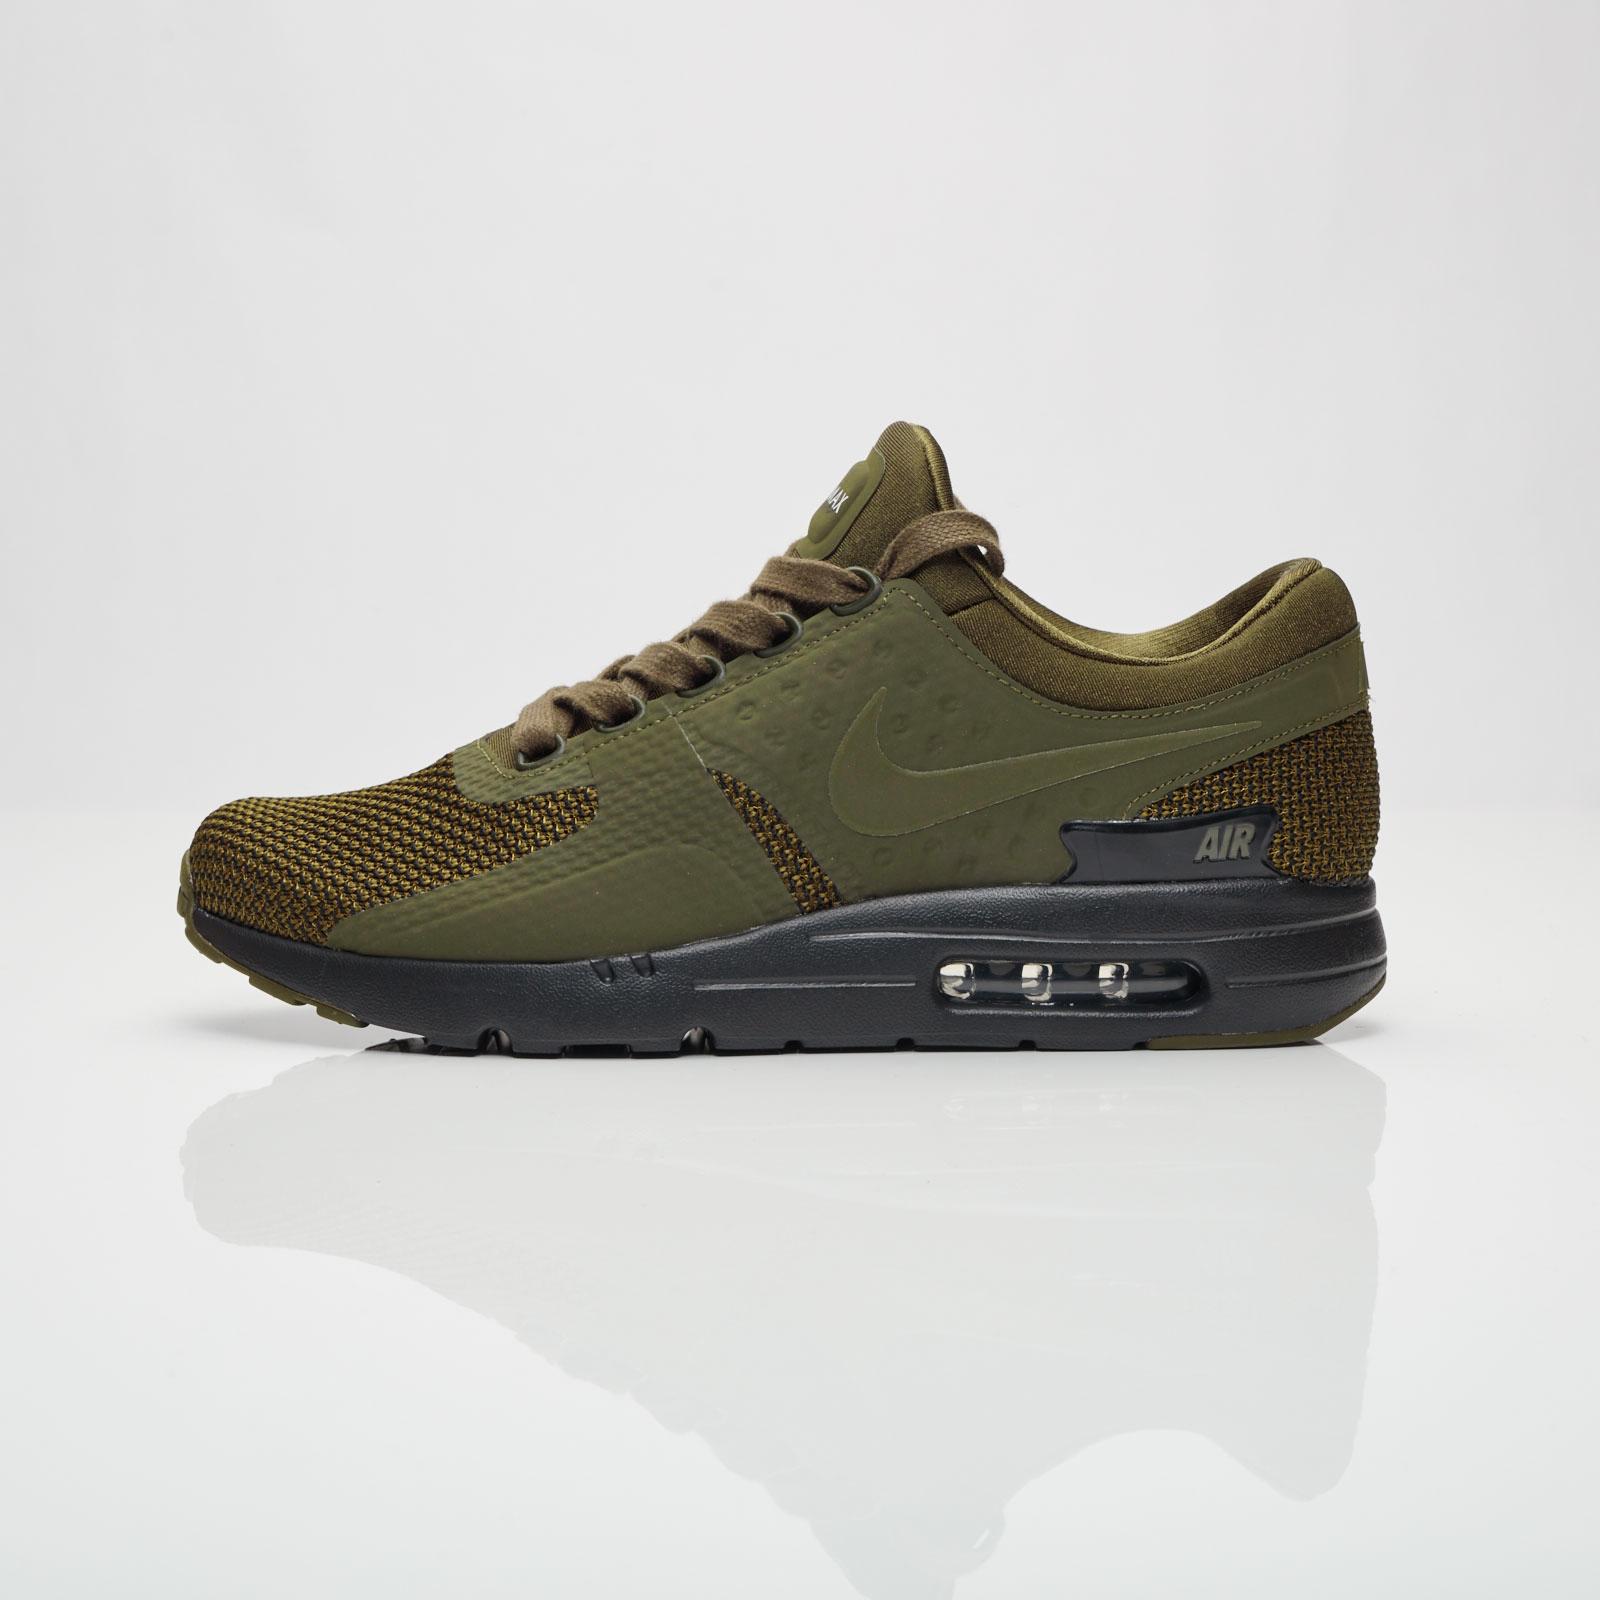 Nike Air Max Zero Premium 881982 300 Sneakersnstuff I